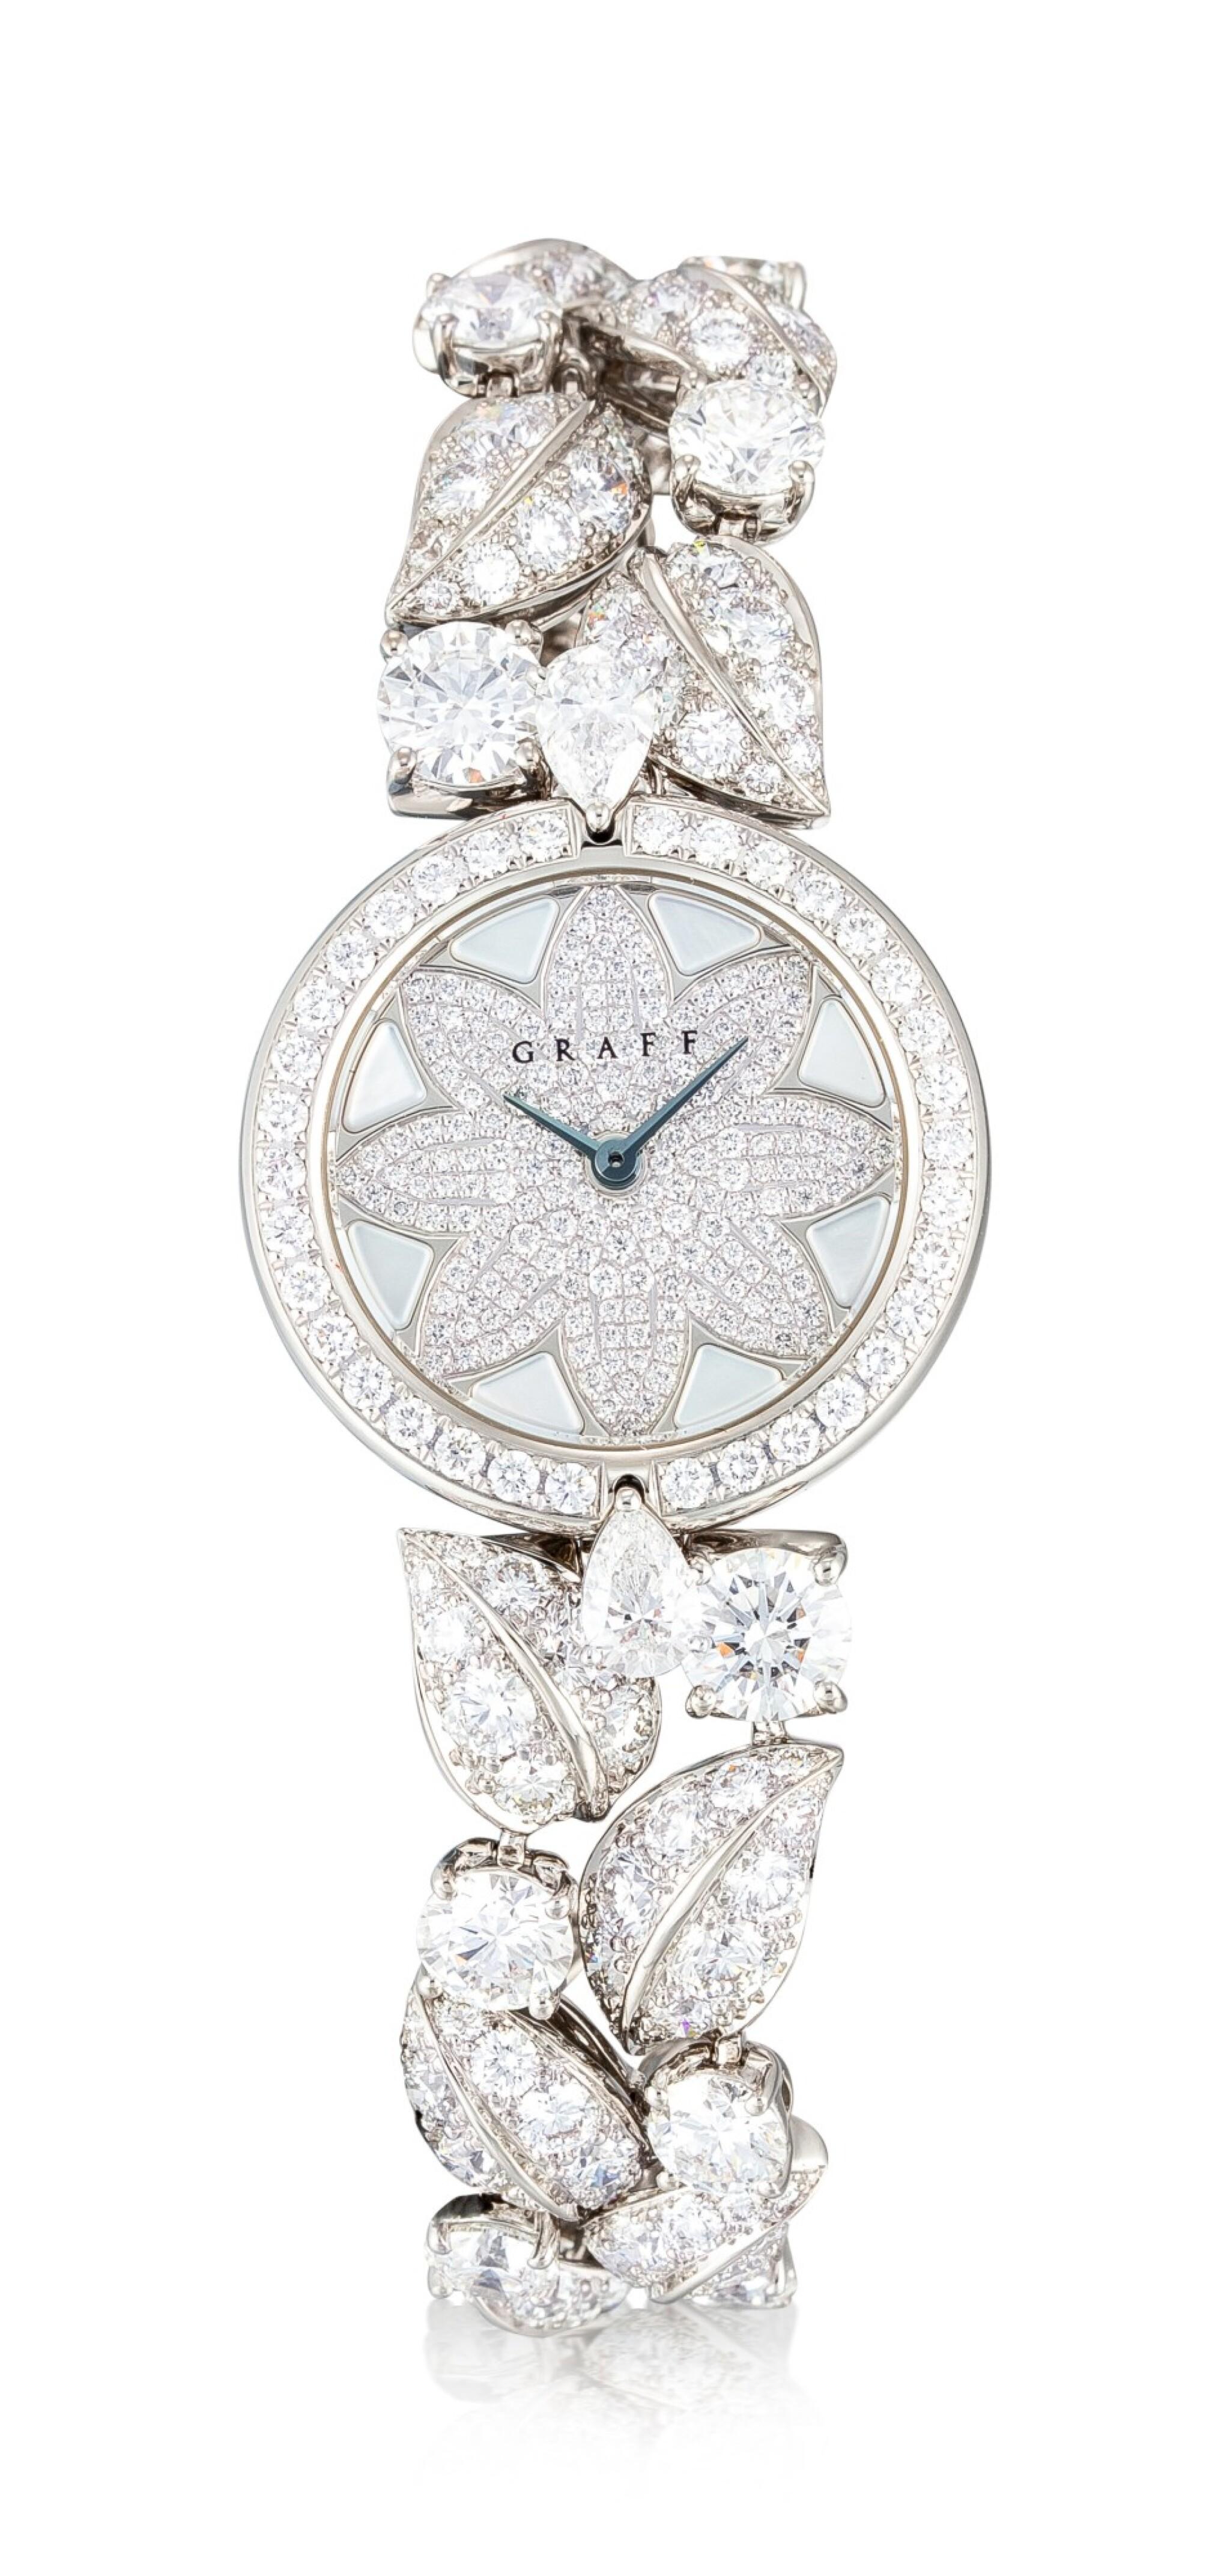 View full screen - View 1 of Lot 1057. 'Graff Leaf' Reference GL25WGDDDD, Limited Edition White Gold and Diamond-Set Wristwatch, Number 1   格拉夫  Graff Leaf編號GL25WGDDDD,限量版白金鑲鑽石腕表,編號1,約2010年製.